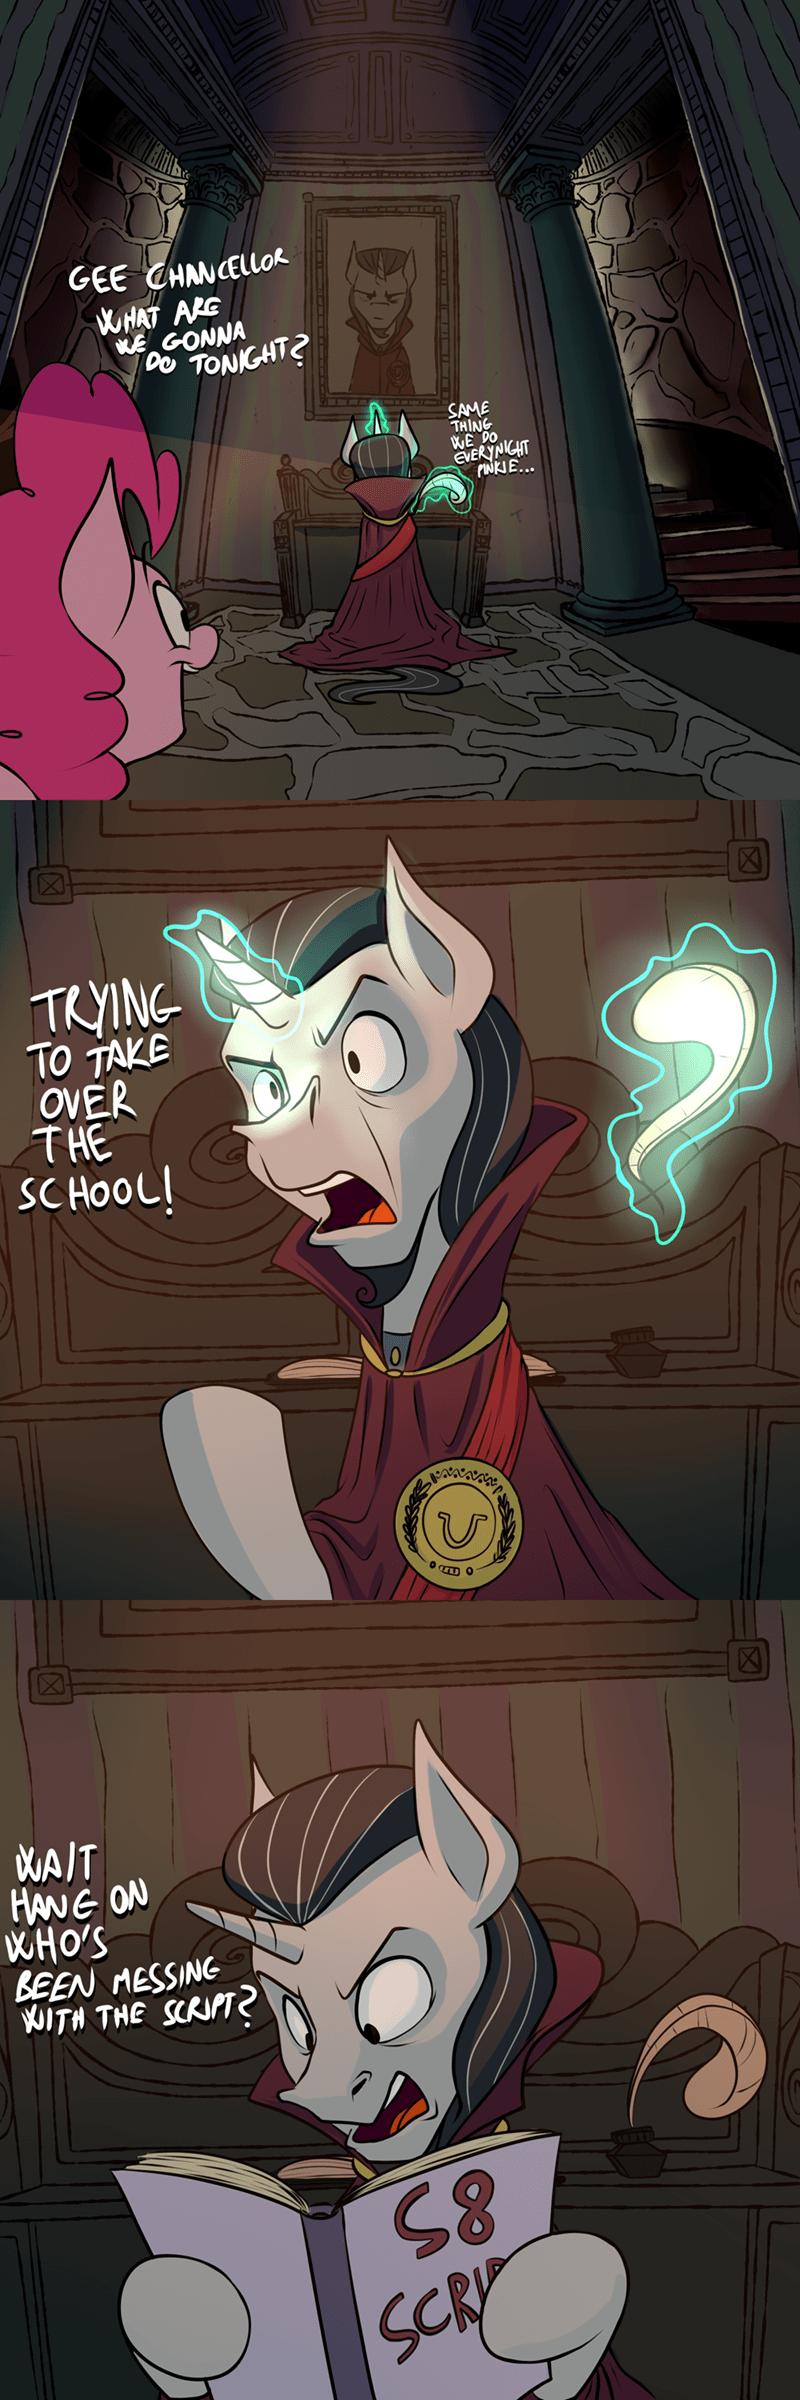 Anon's Pie Adventure my little brony - anon the anon - my little pony, friendship